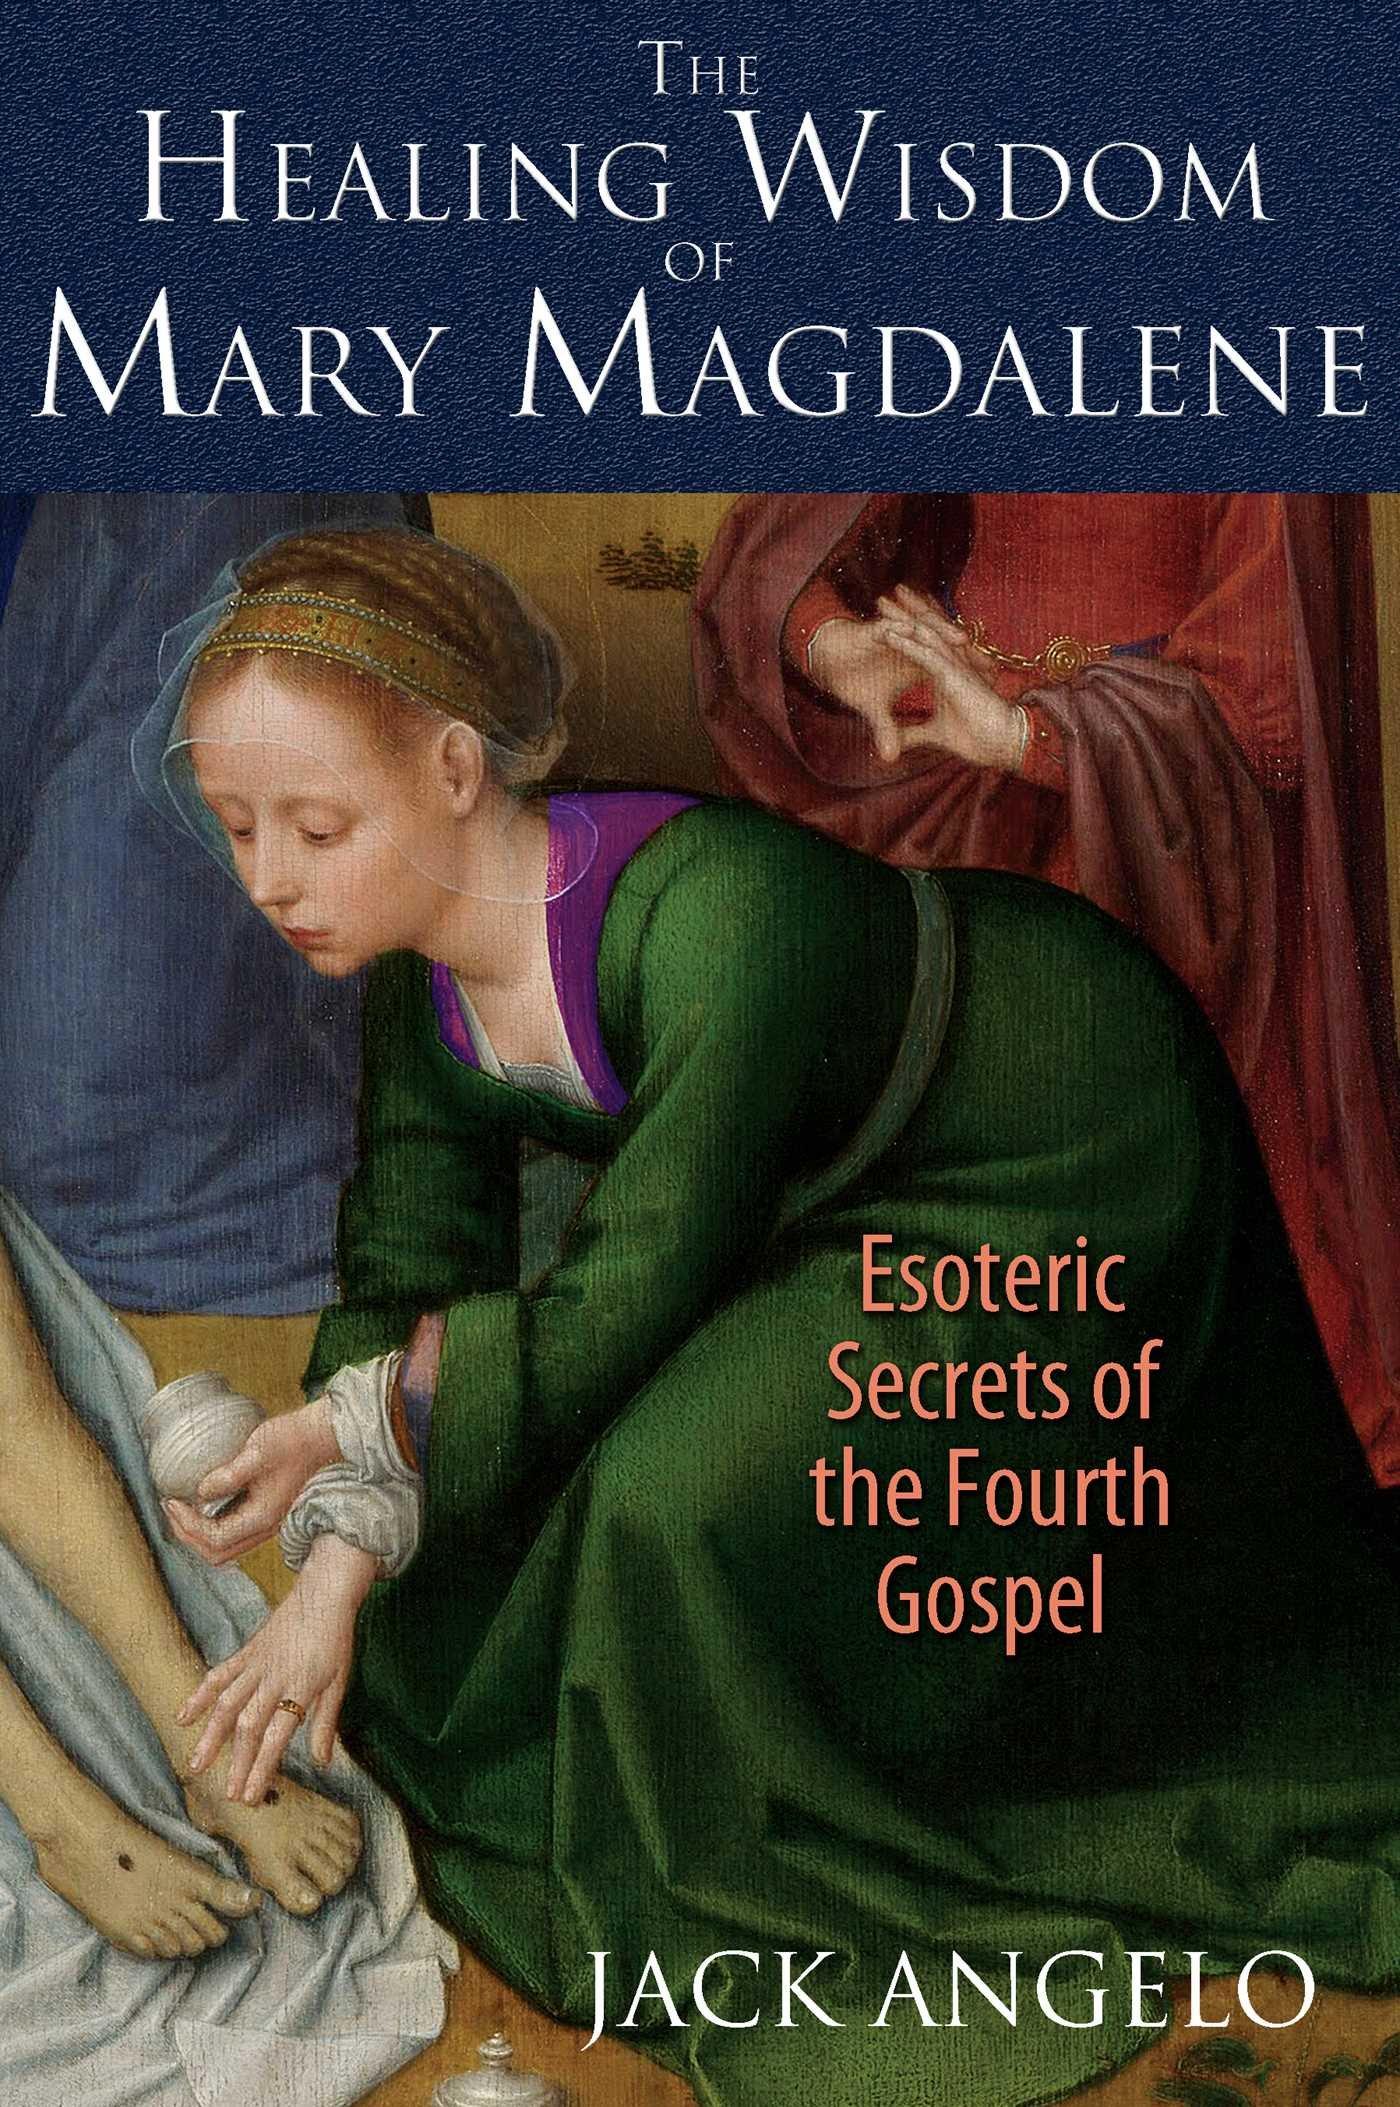 The Healing Wisdom of Mary Magdalene: Esoteric Secrets of the Fourth  Gospel: Jack Angelo: 9781591431992: Amazon.com: Books